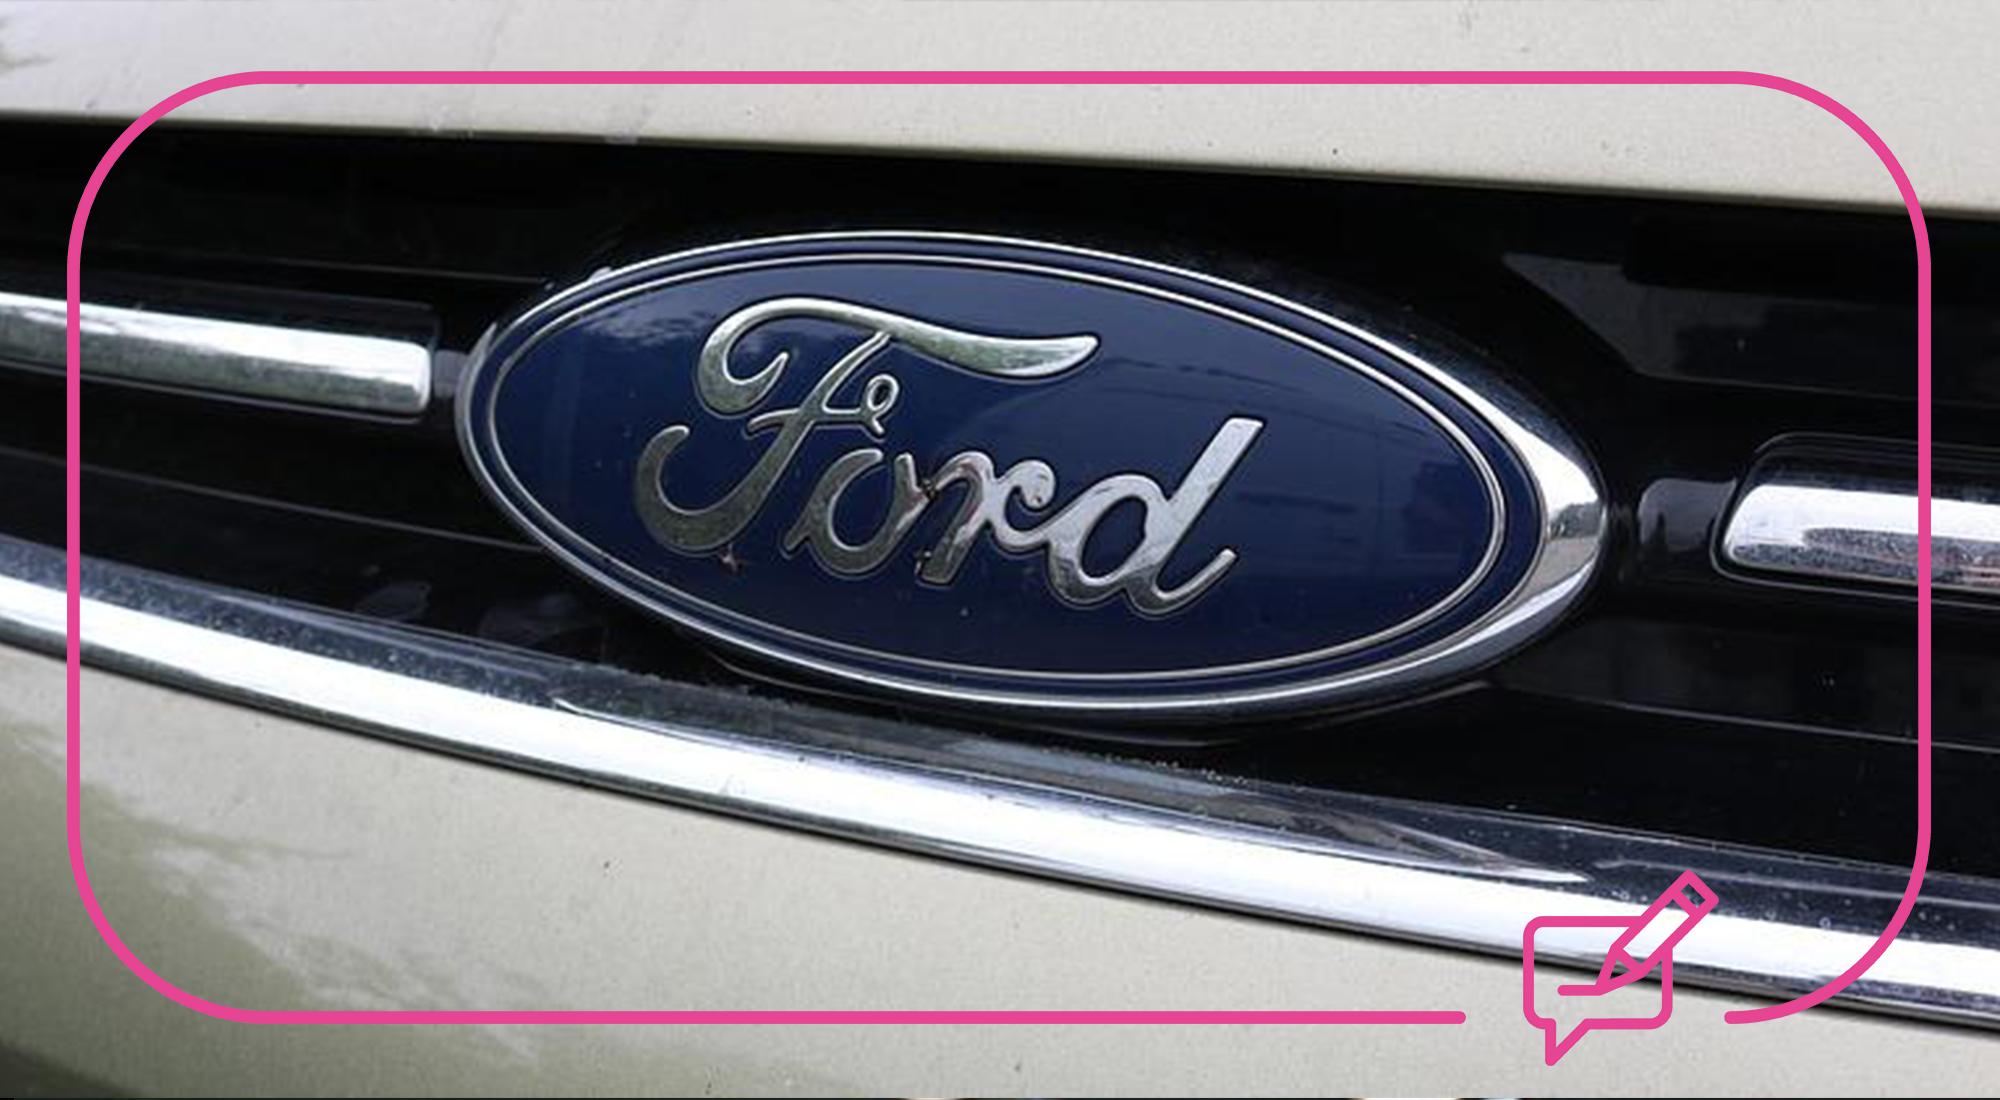 Ford Fiesta Colour Guide